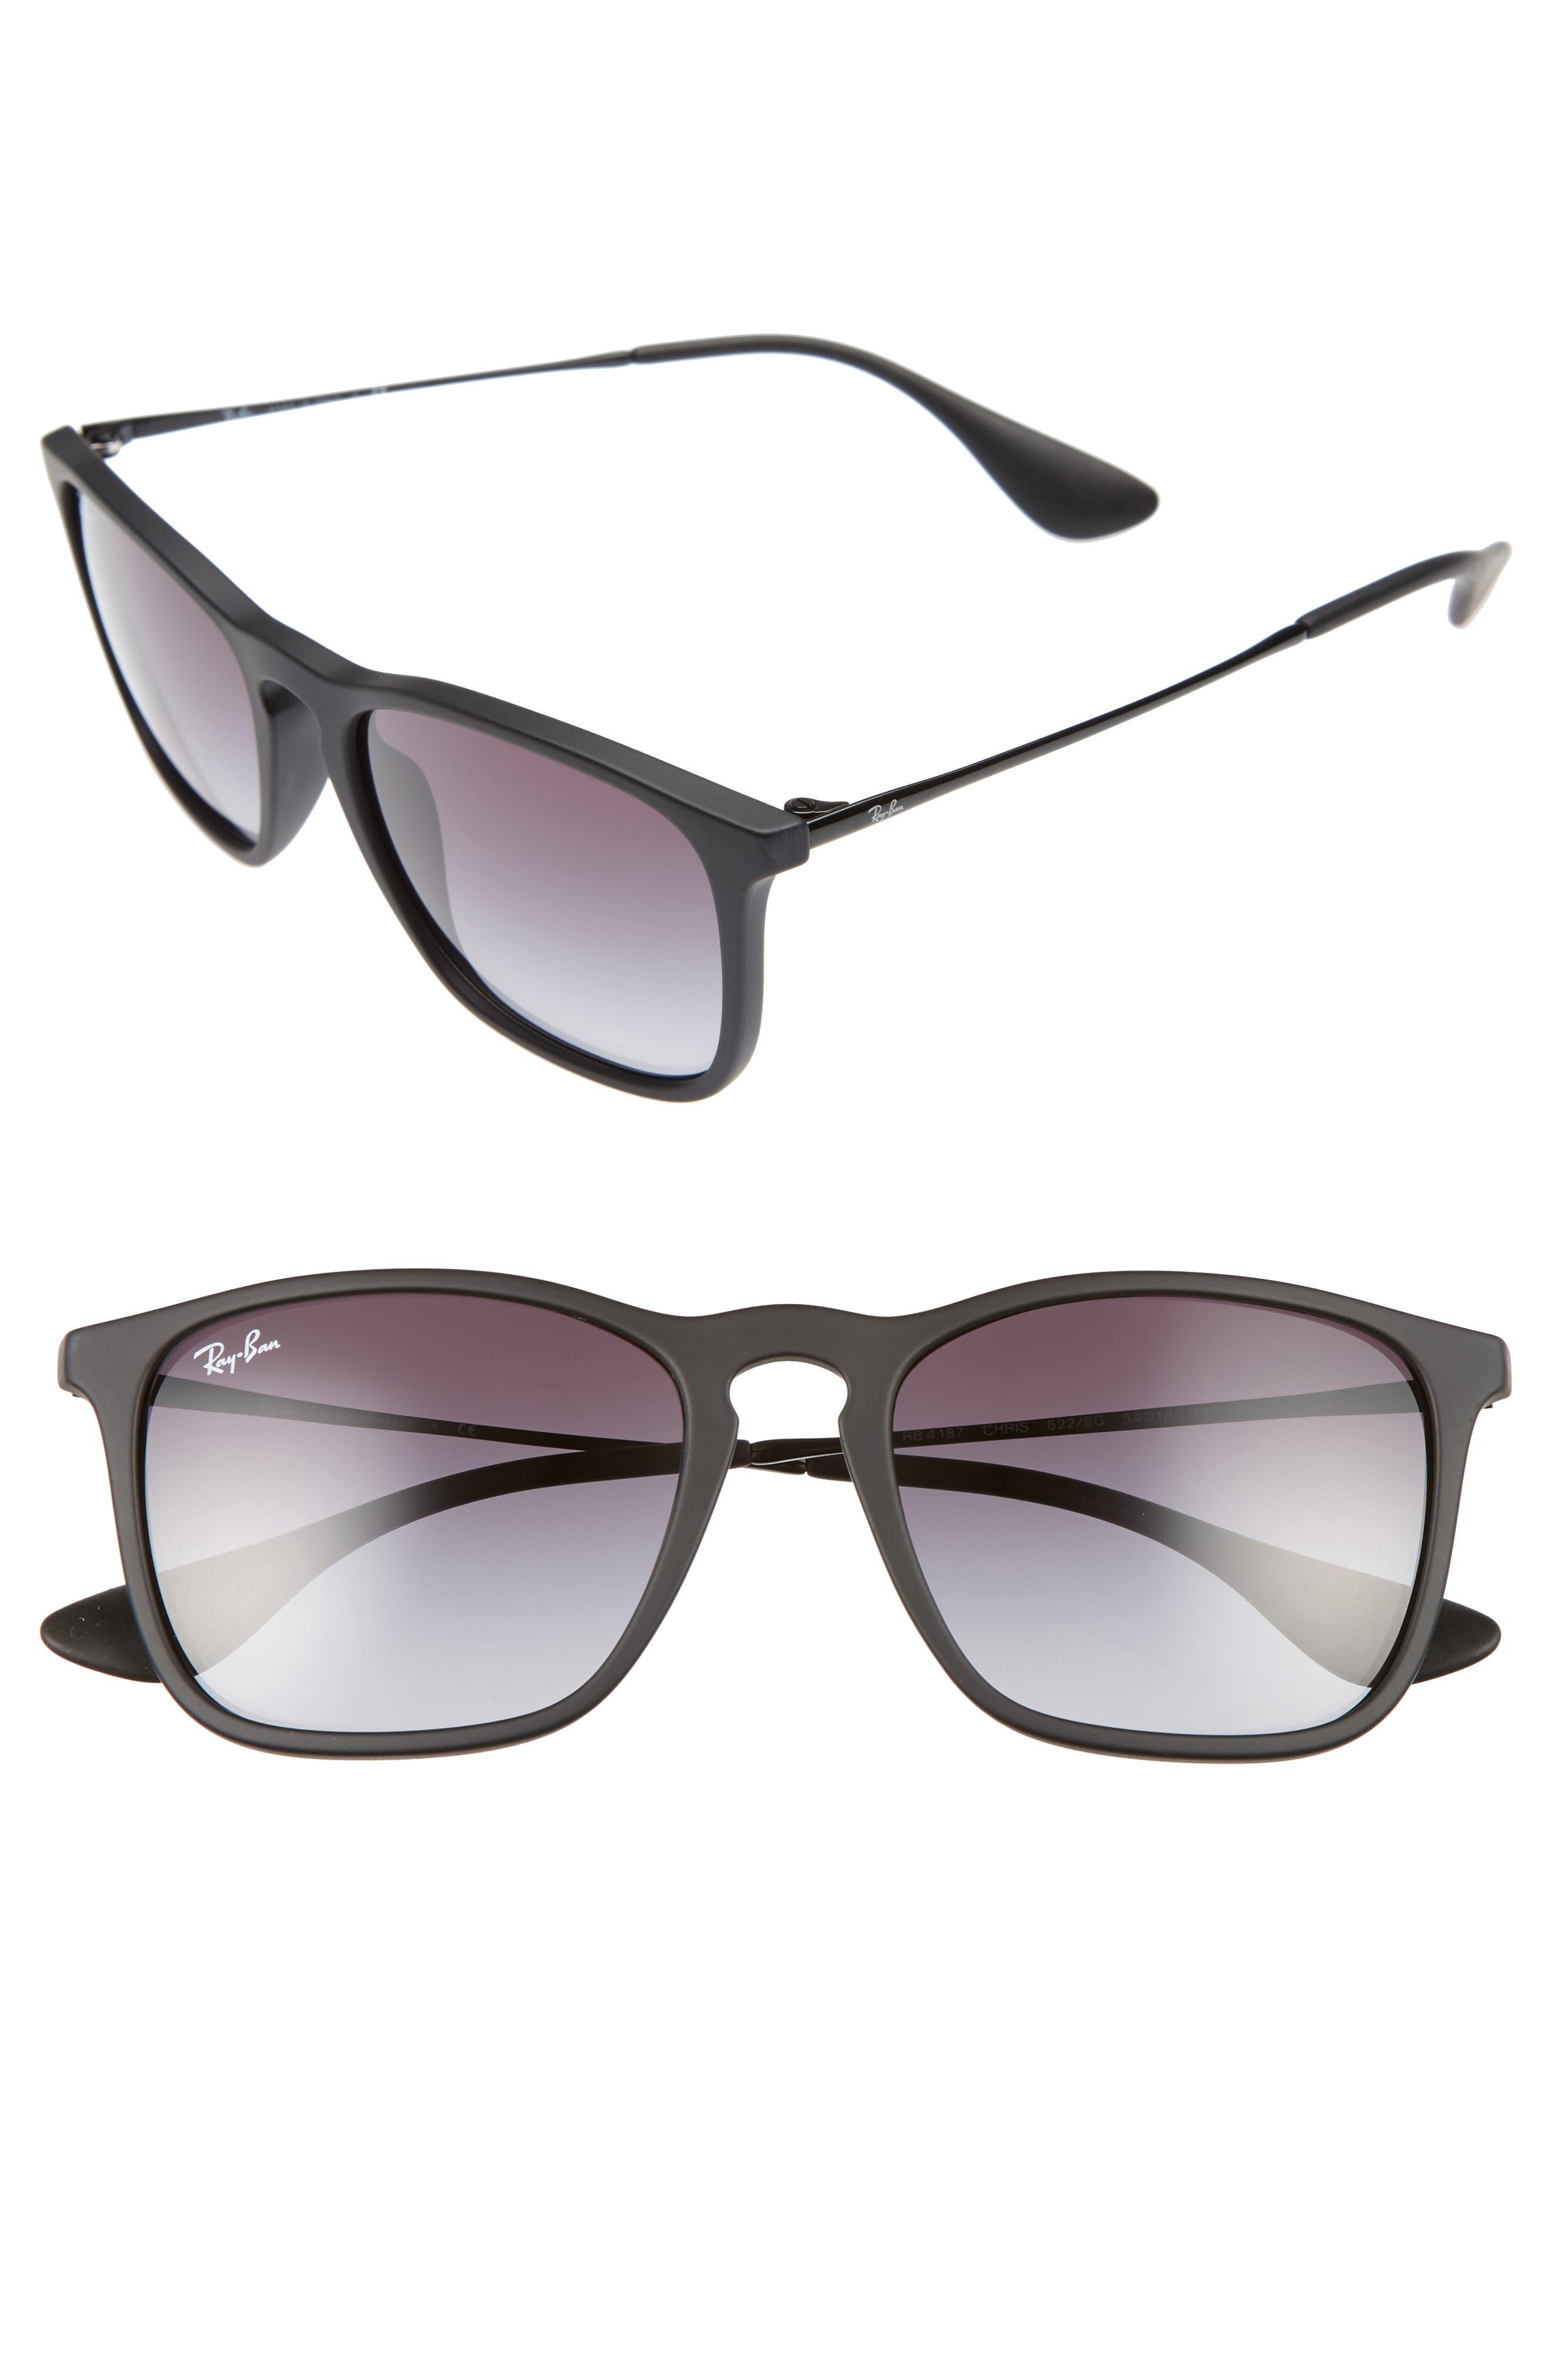 Ray-Ban Chris 5m Gradient Lens Sunglasses -